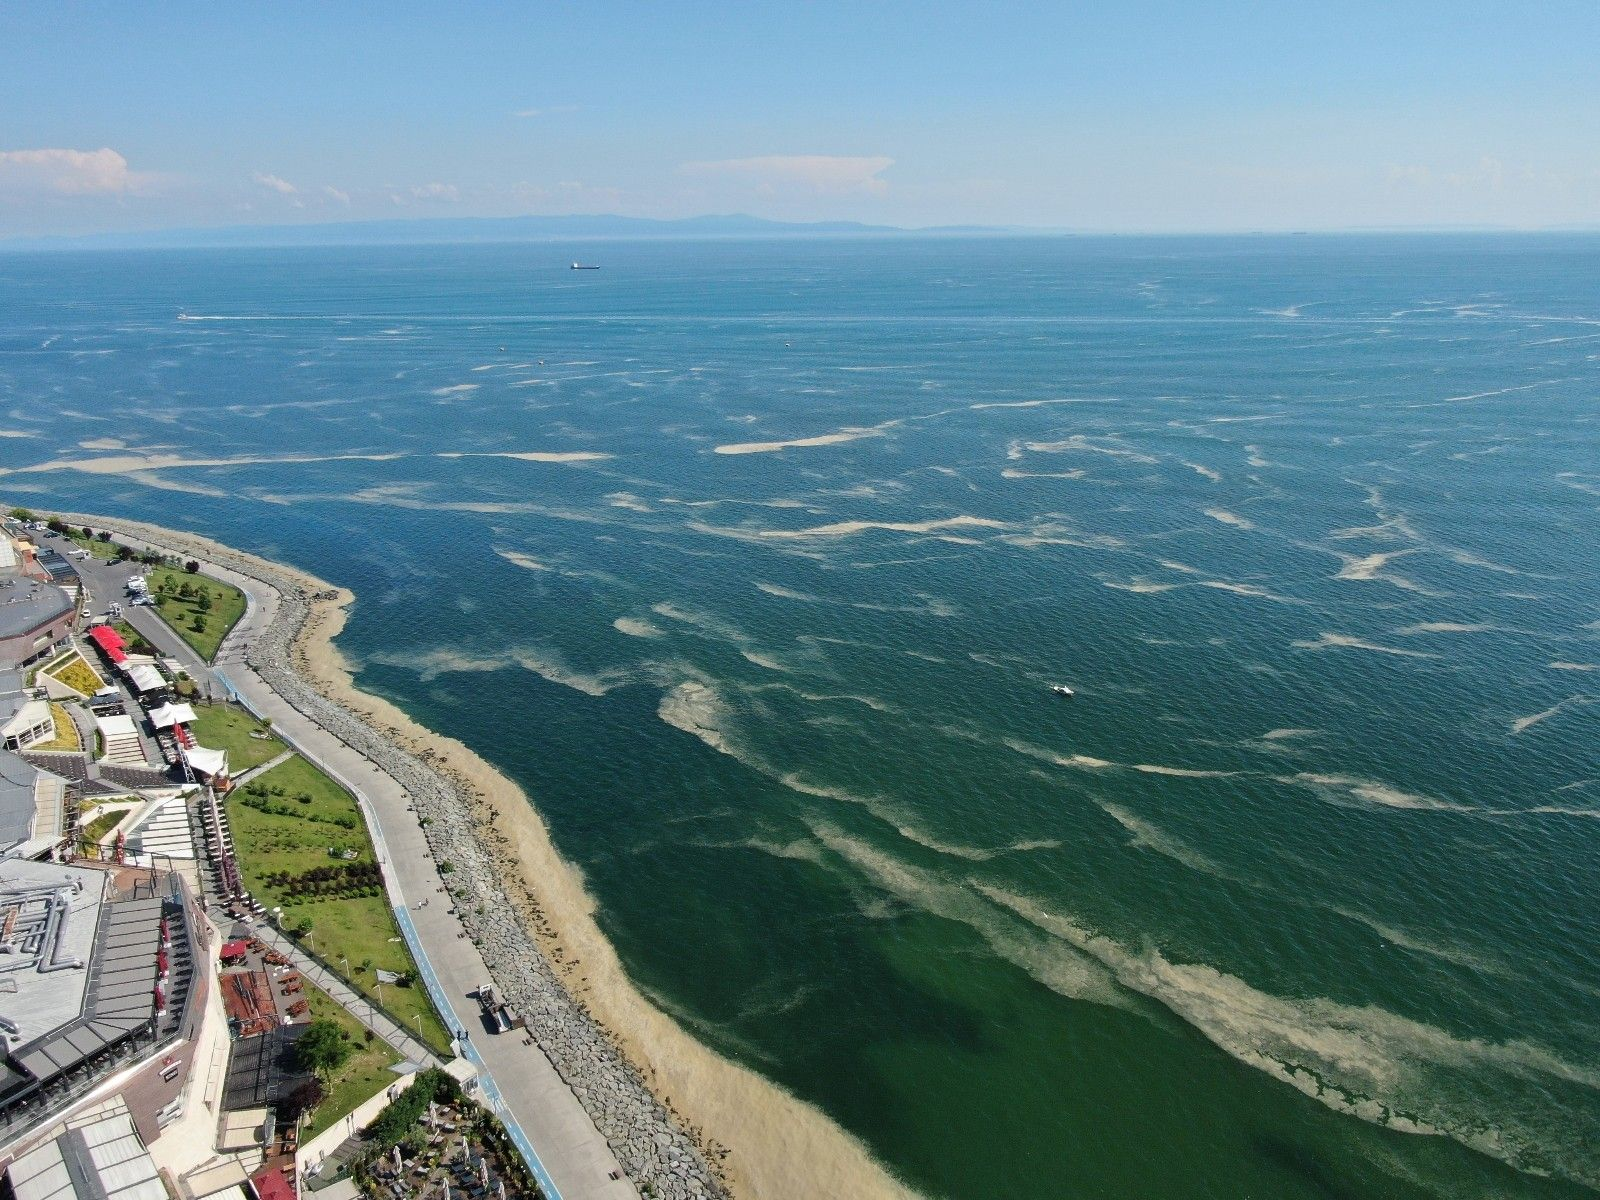 2021/06/deniz-salyasi-bu-kez-bakirkoy-kiyilarini-sardi-20210613AW34-2.jpg